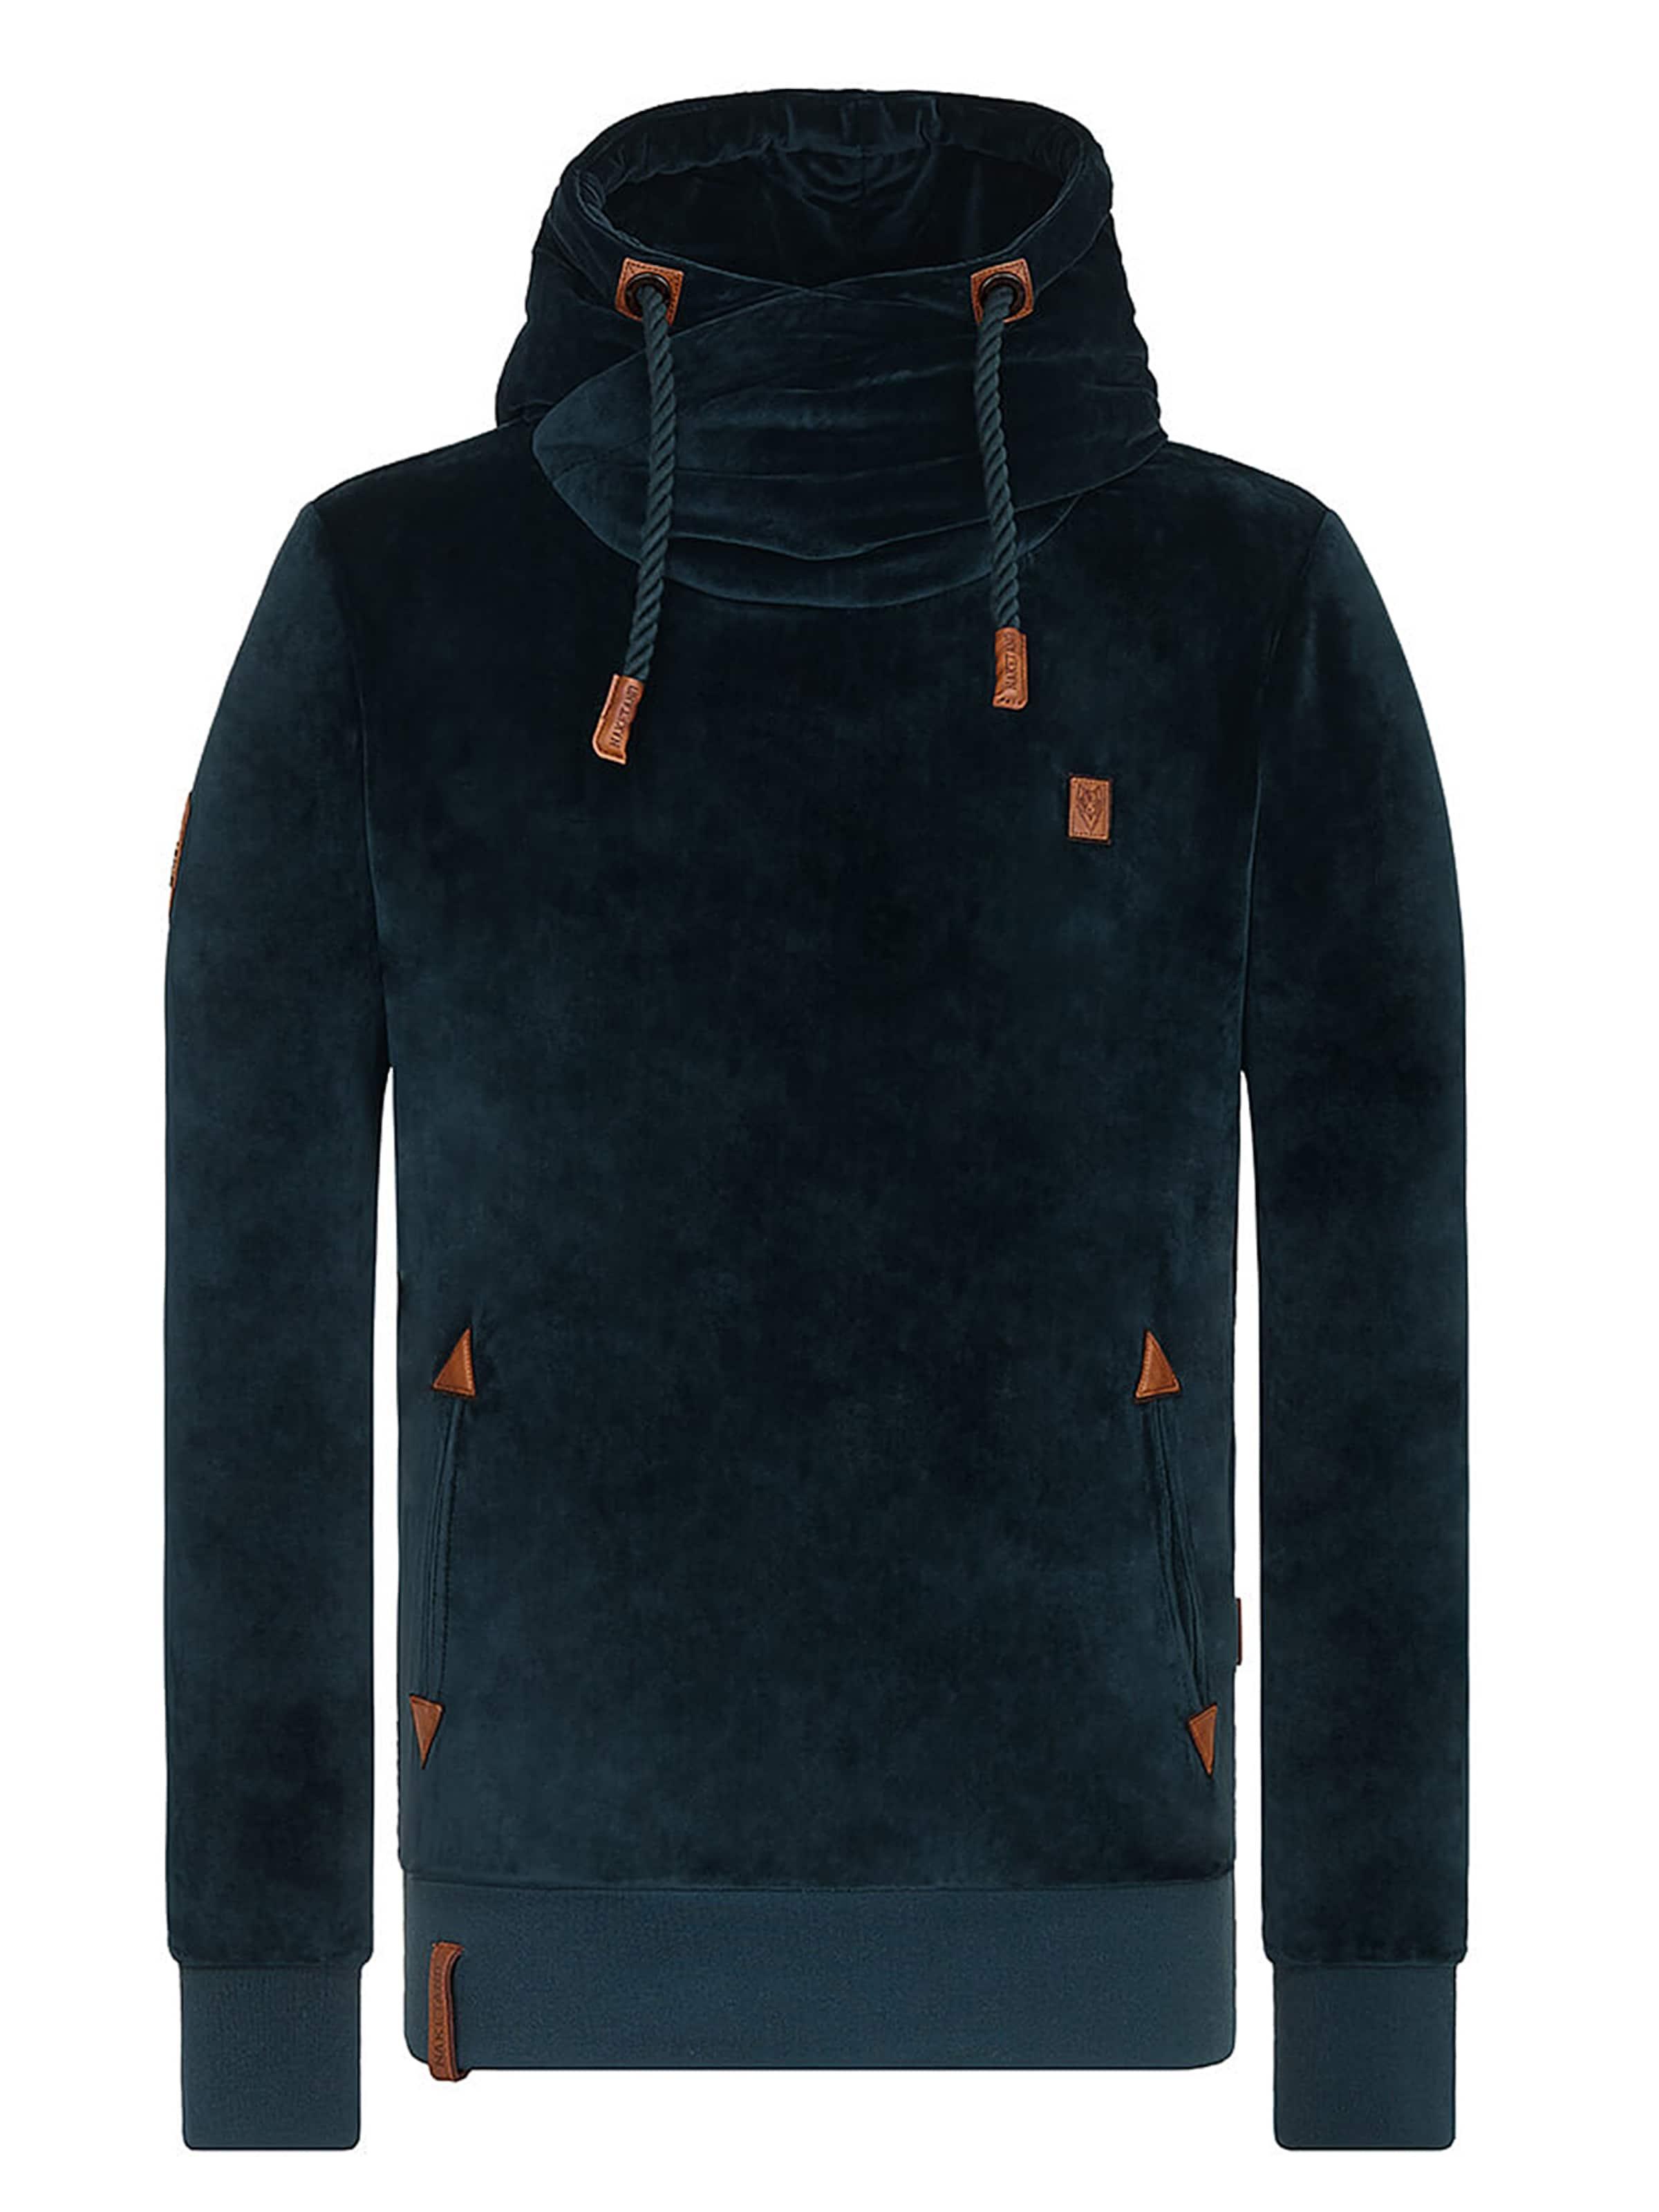 Sweatshirt In Sweatshirt Naketano Dunkelgrün Naketano In n08wOPkX